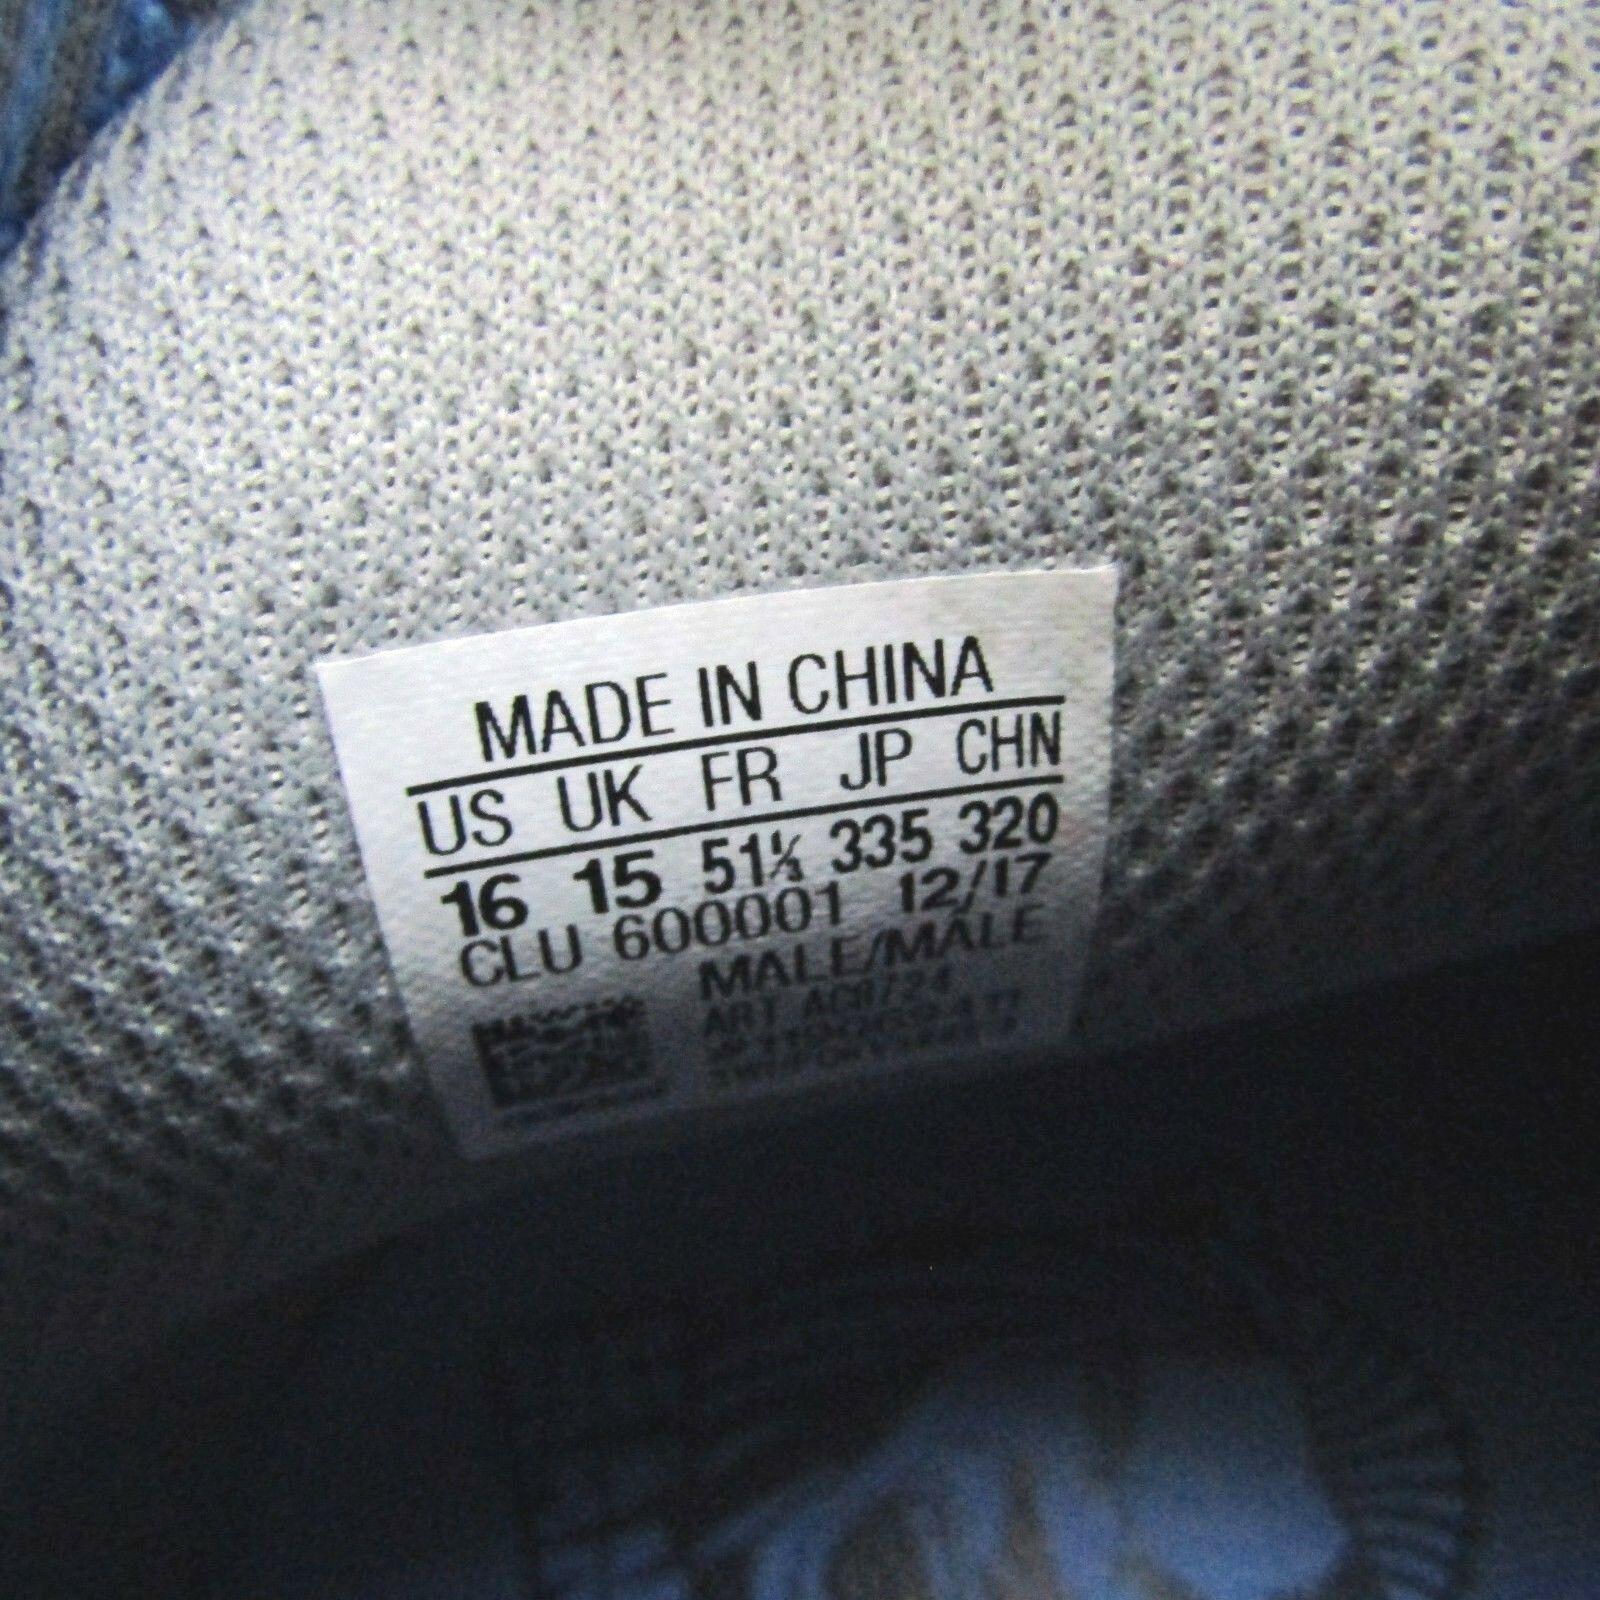 Adidas Crazy Esplosiva Primeknit Kenneth Sonia Ferrari Pe Pepite Nets AC8724 image 8